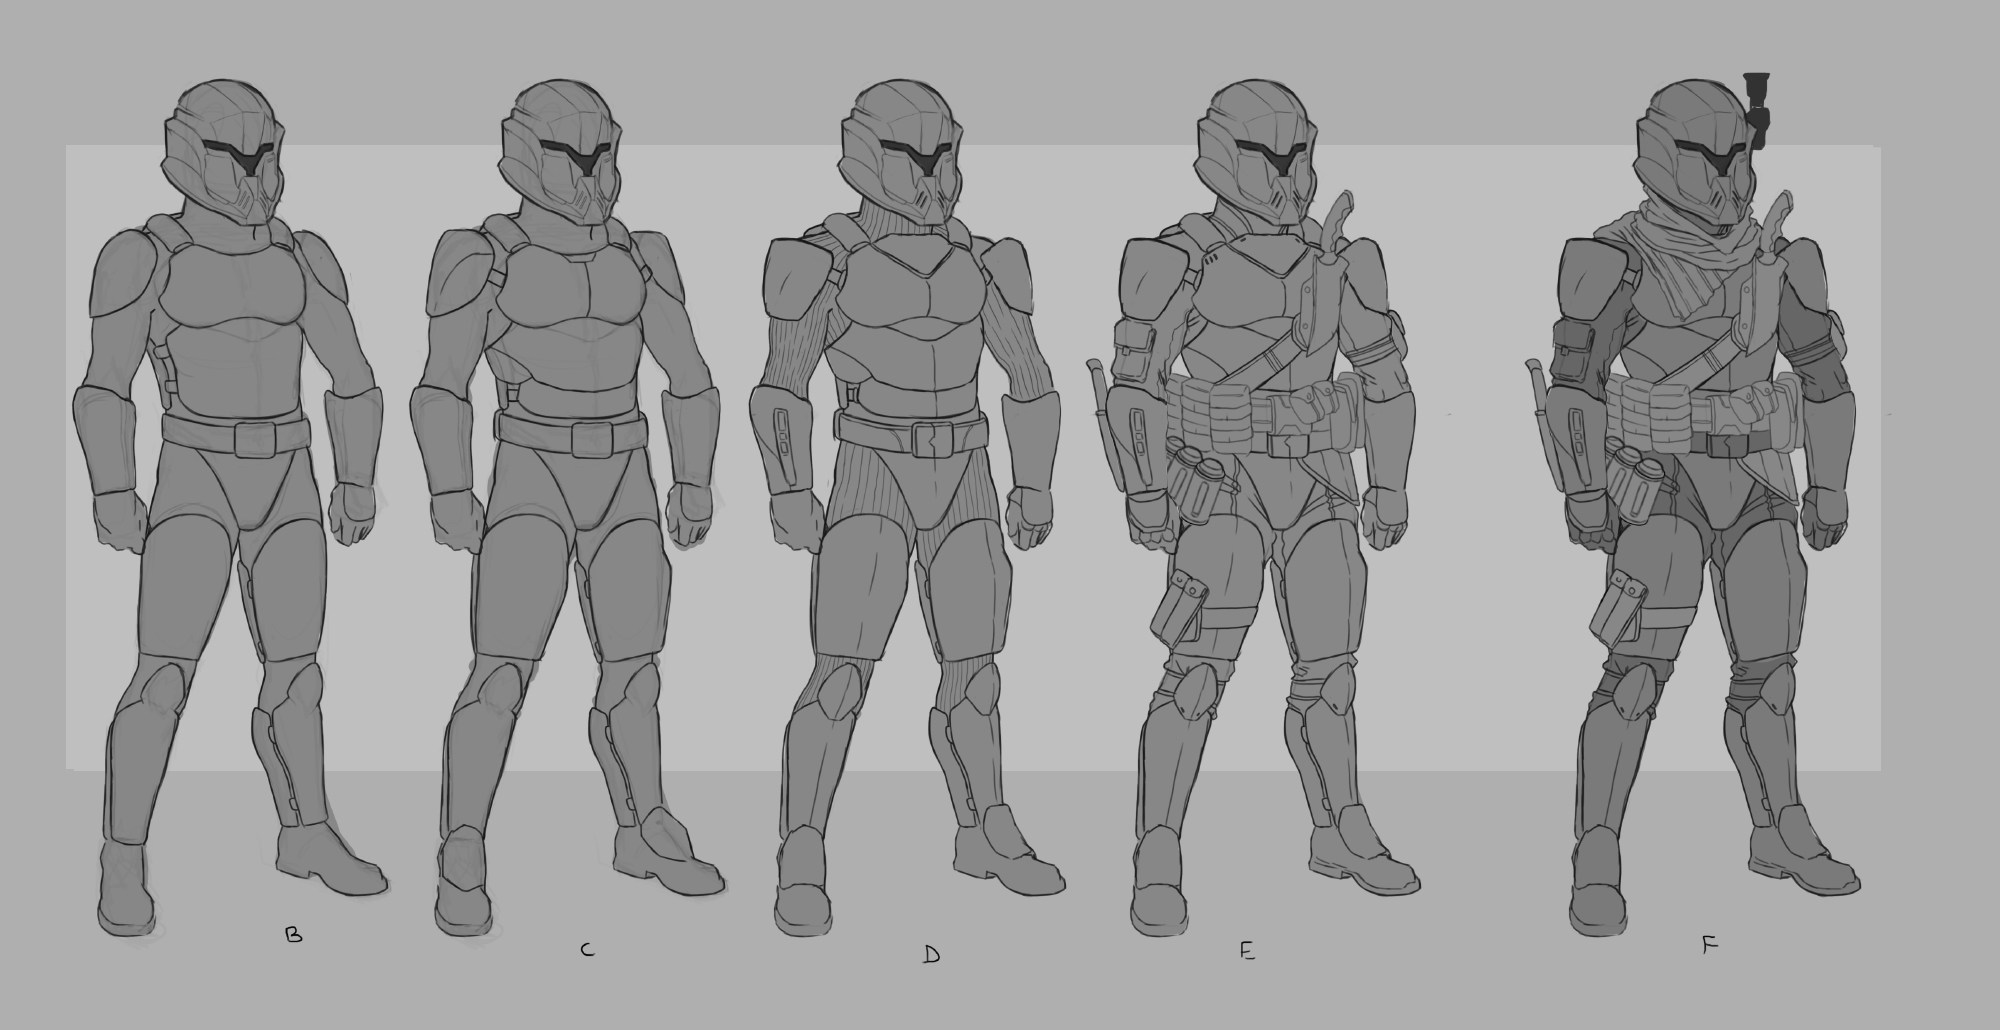 Galaxy's Edge: Legionnaire concept art via Jason Anspach's blog